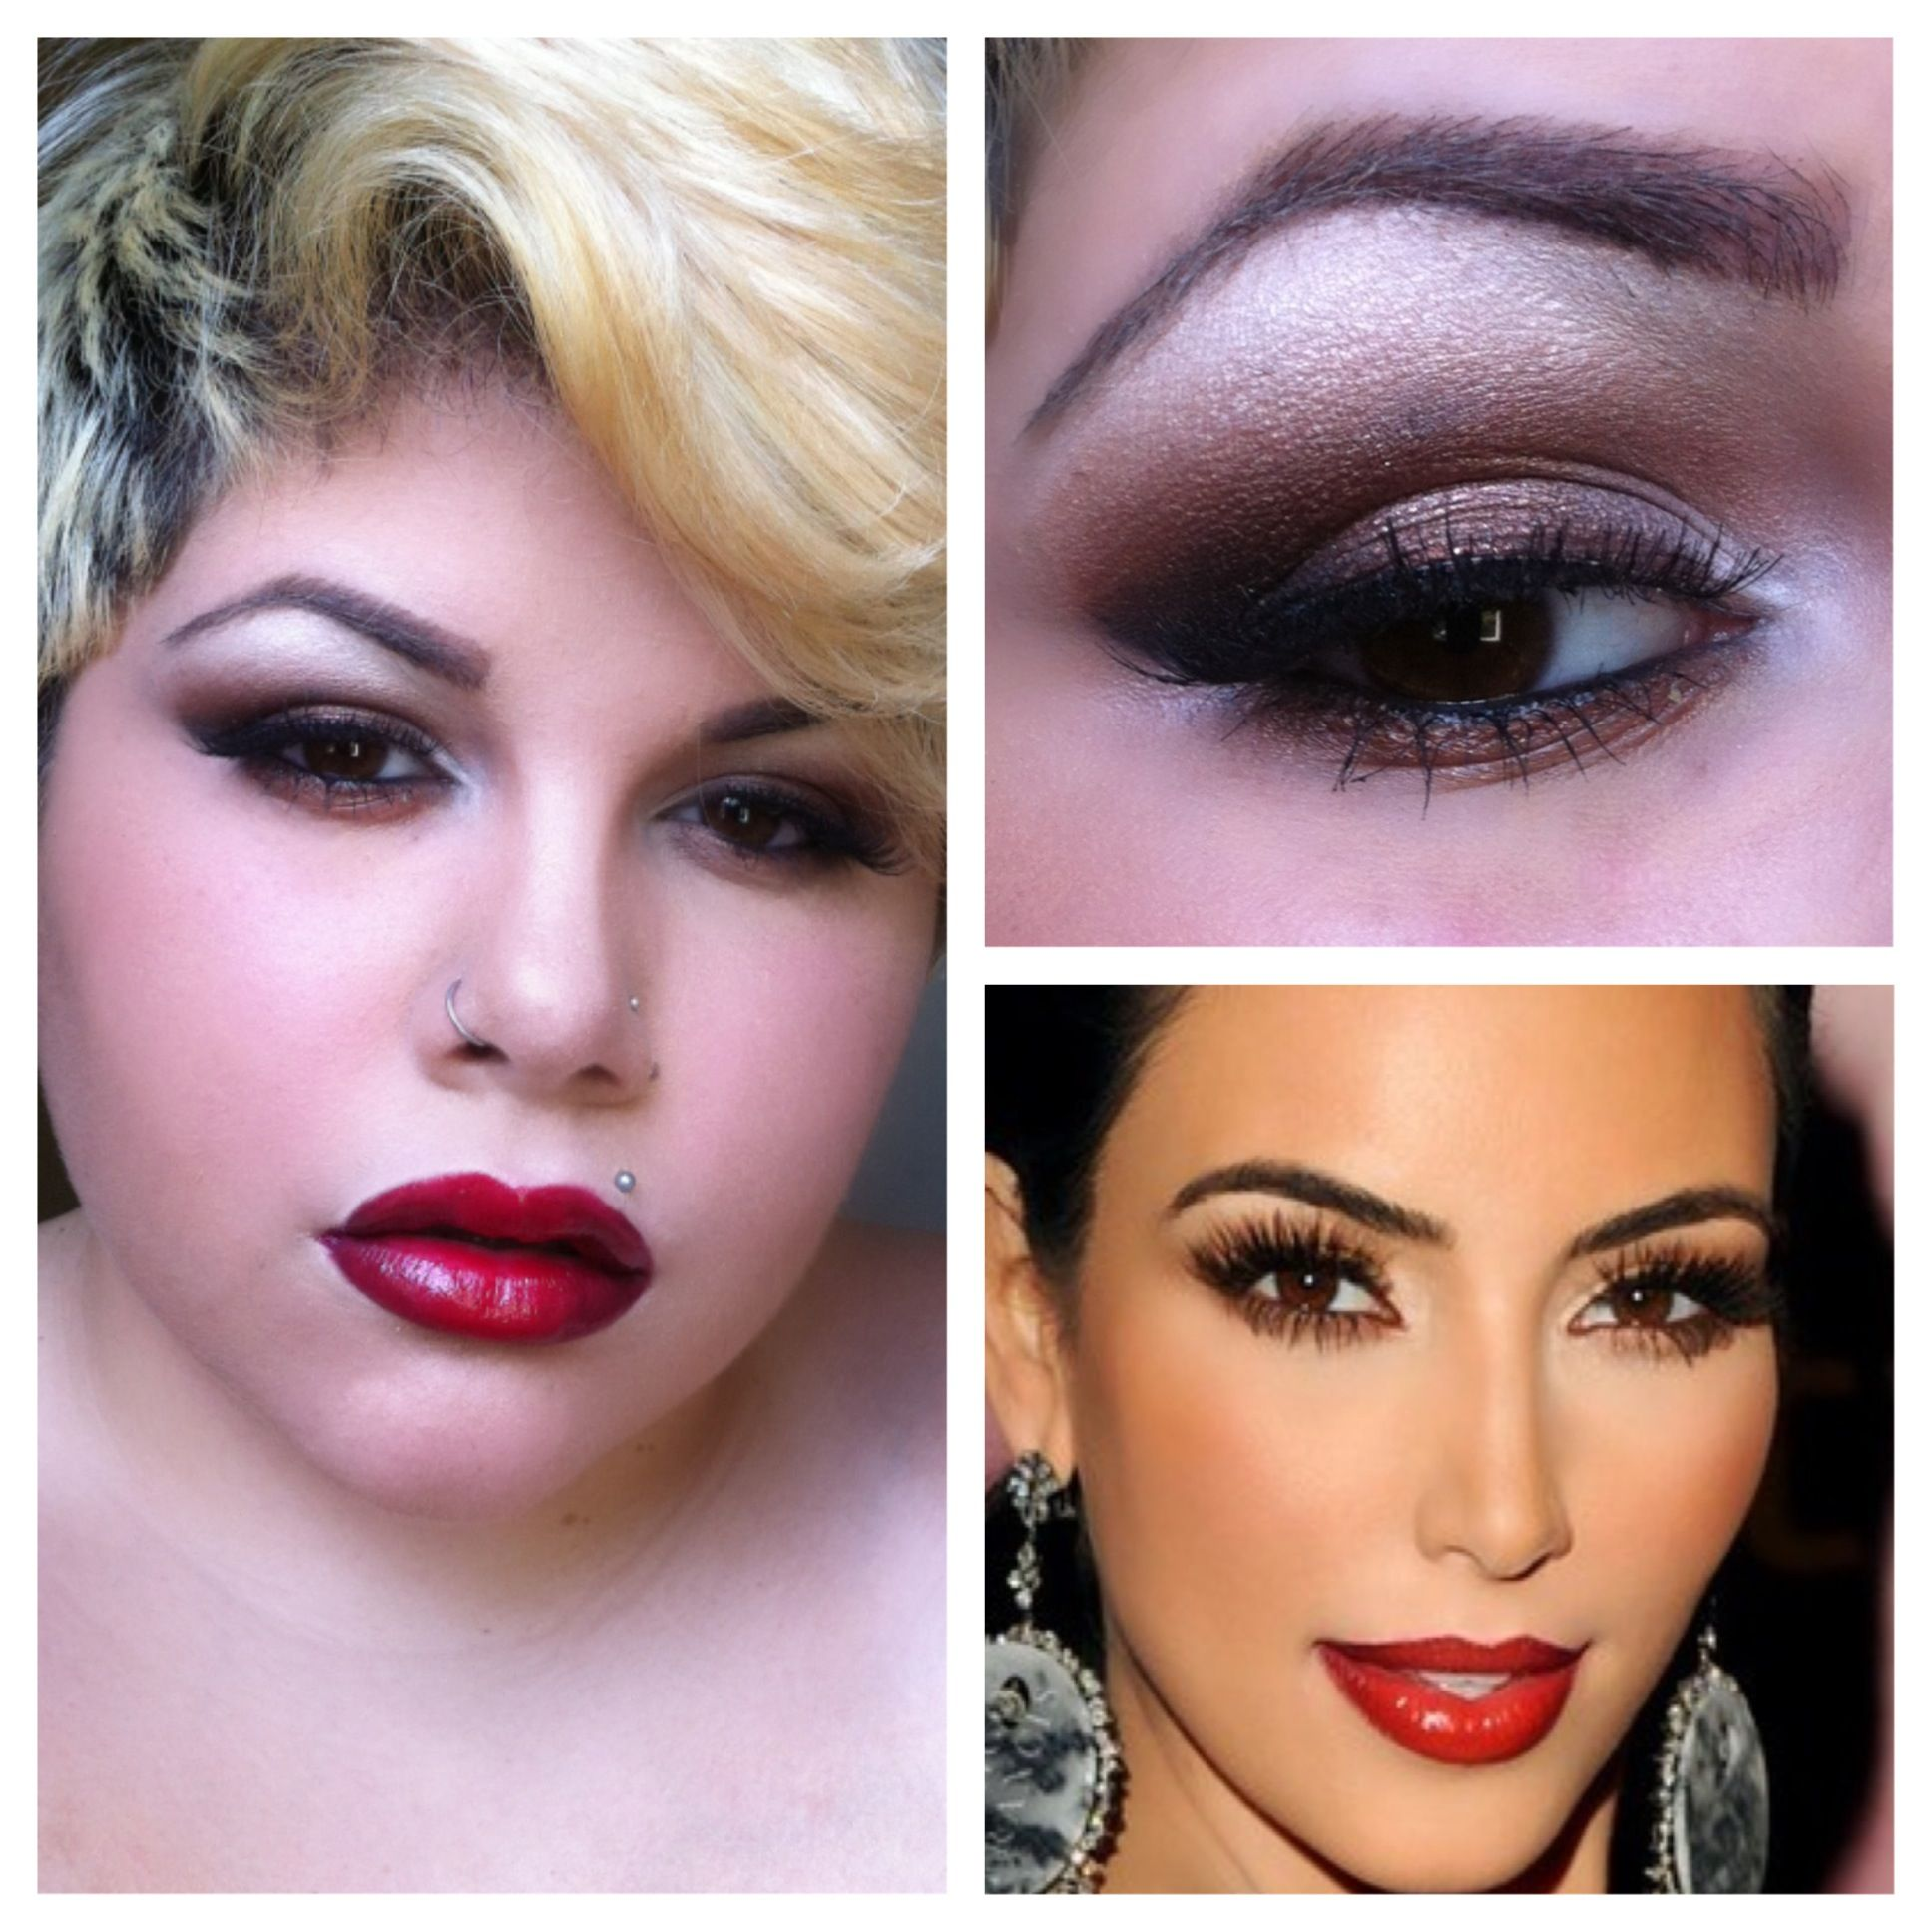 Recreated a Kim Kardashian look